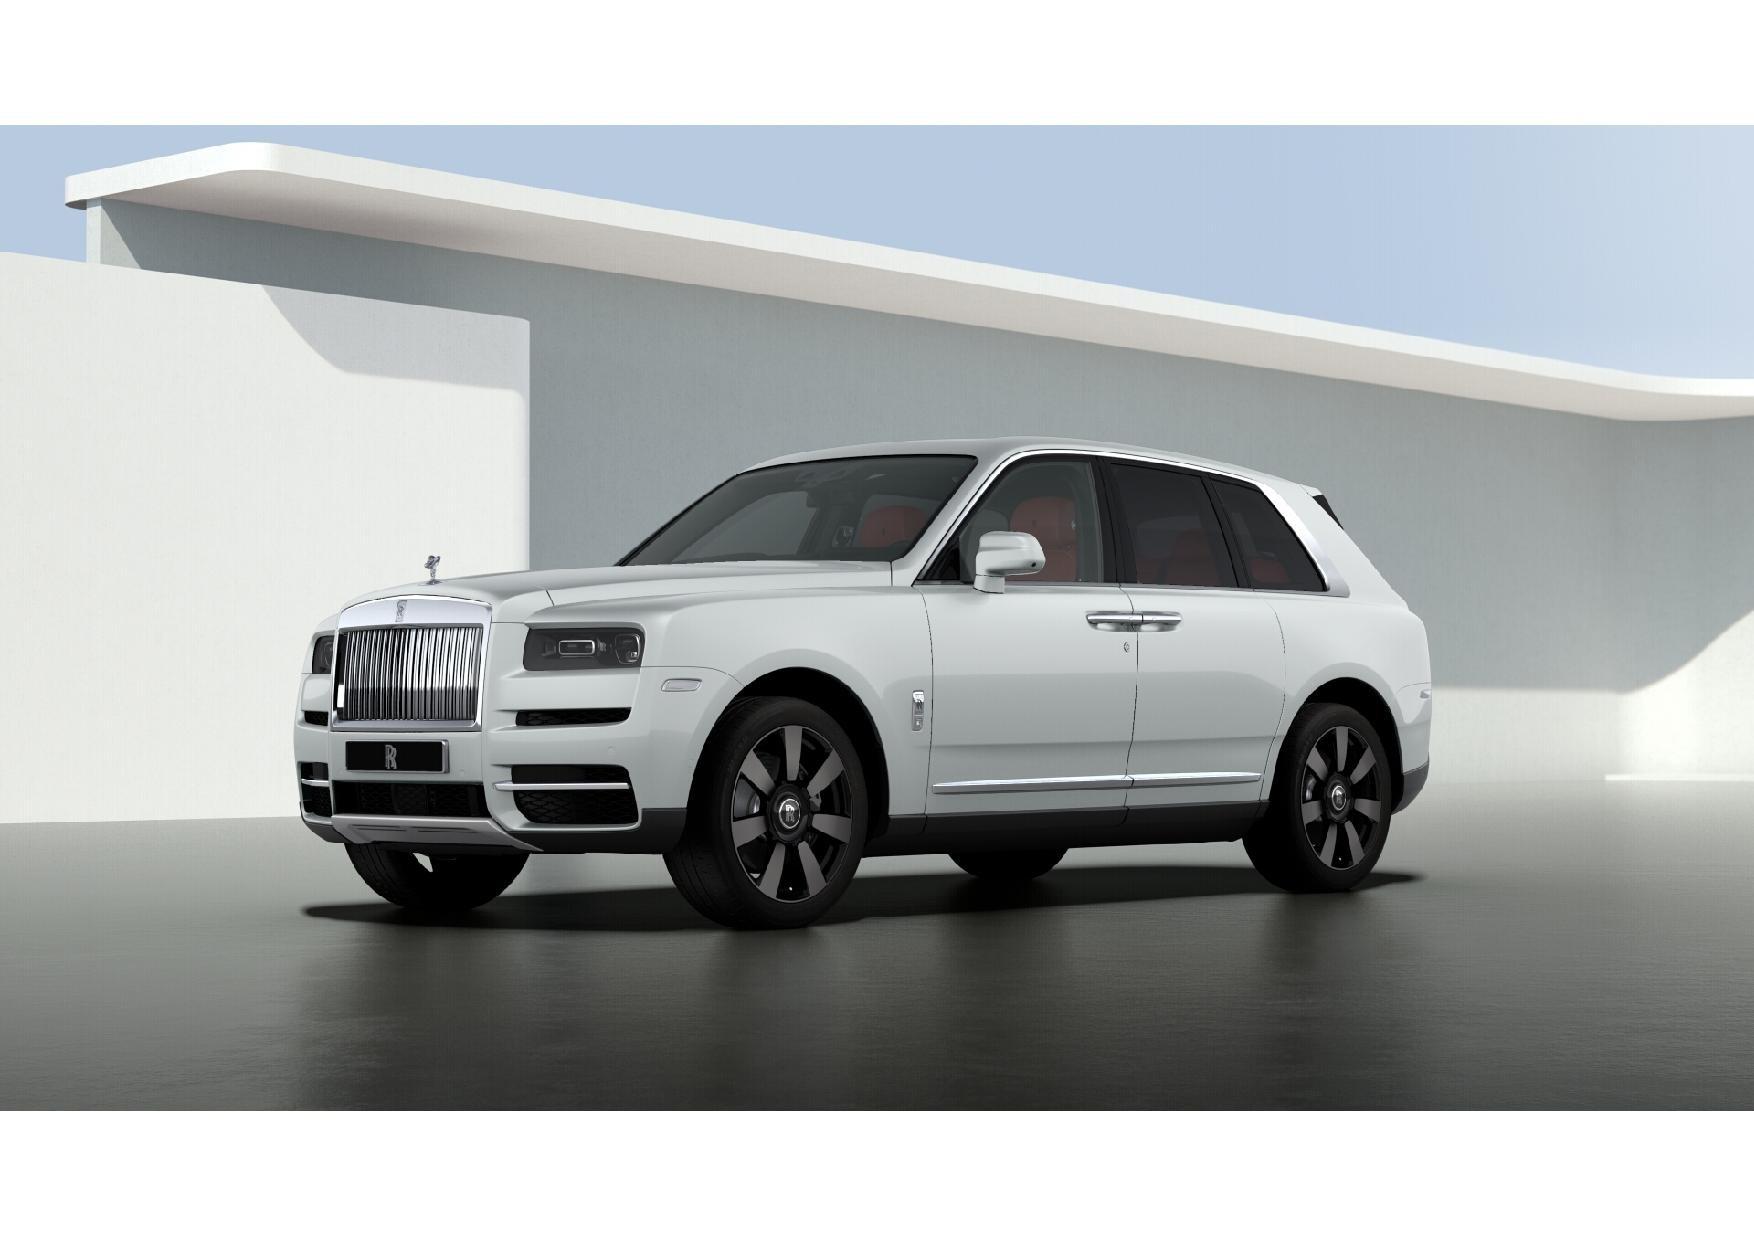 New 2021 Rolls-Royce Cullinan for sale Sold at Bugatti of Greenwich in Greenwich CT 06830 1